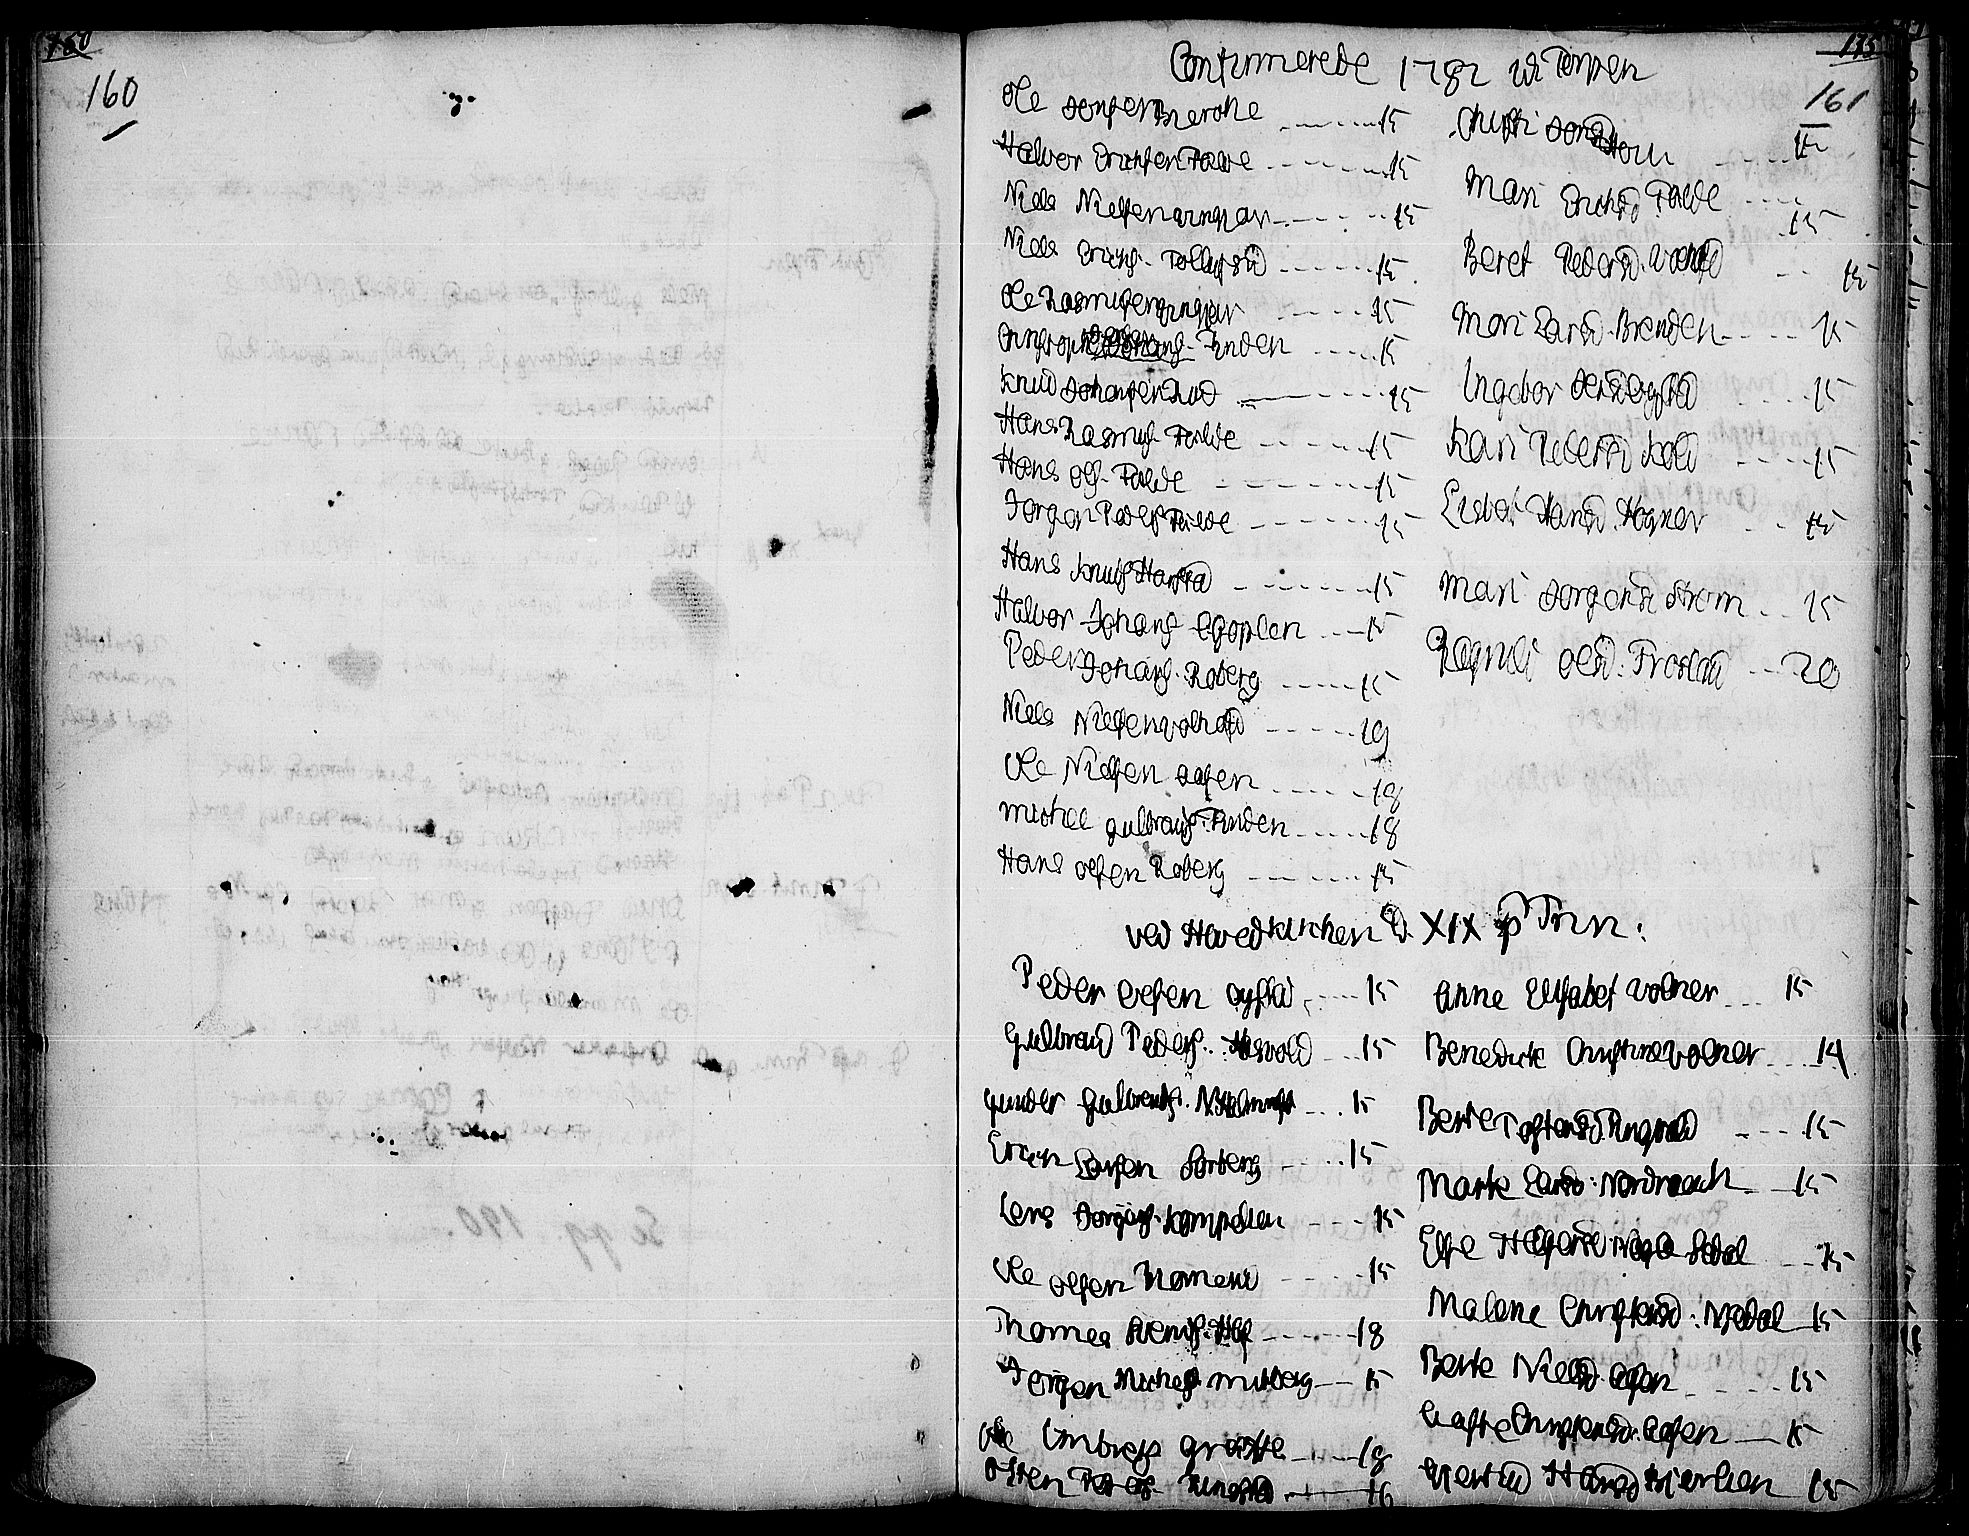 SAH, Land prestekontor, Ministerialbok nr. 5, 1765-1784, s. 160-161